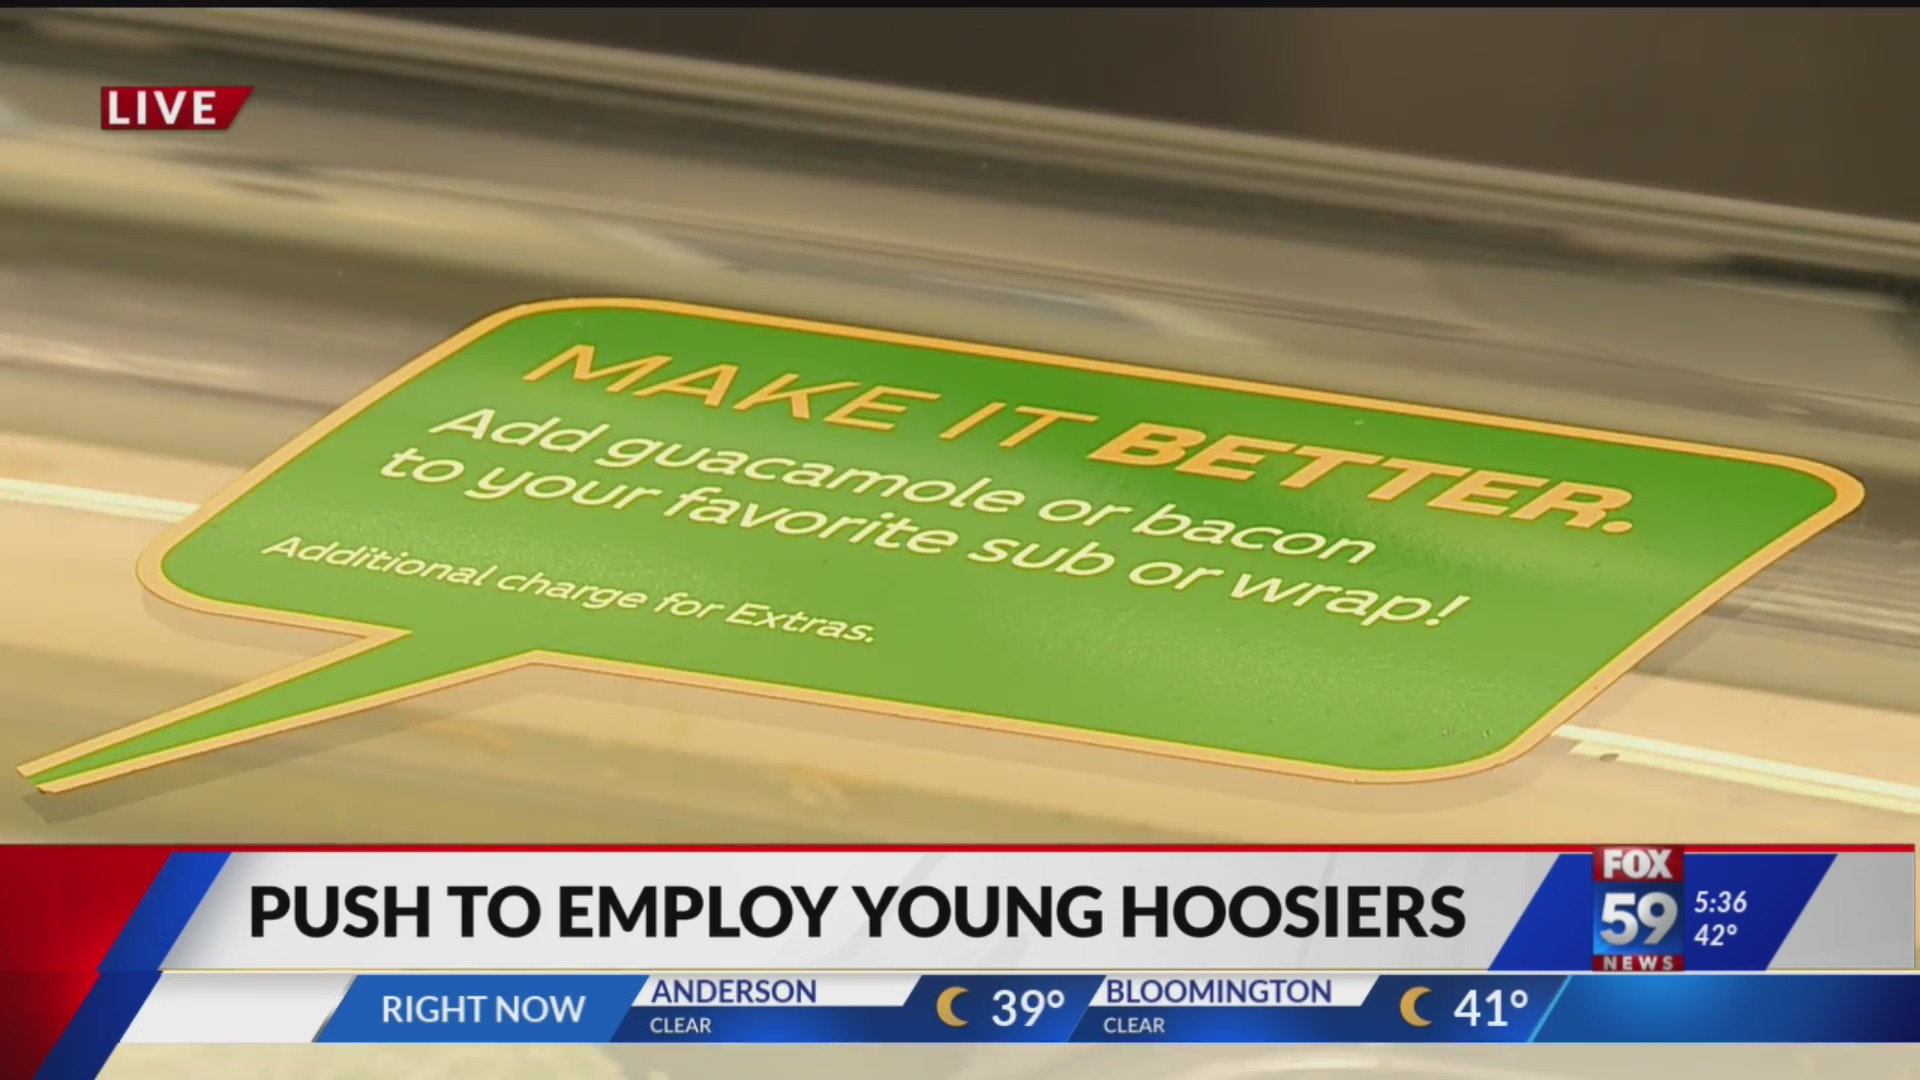 Summer job opportunities in Indianapolis